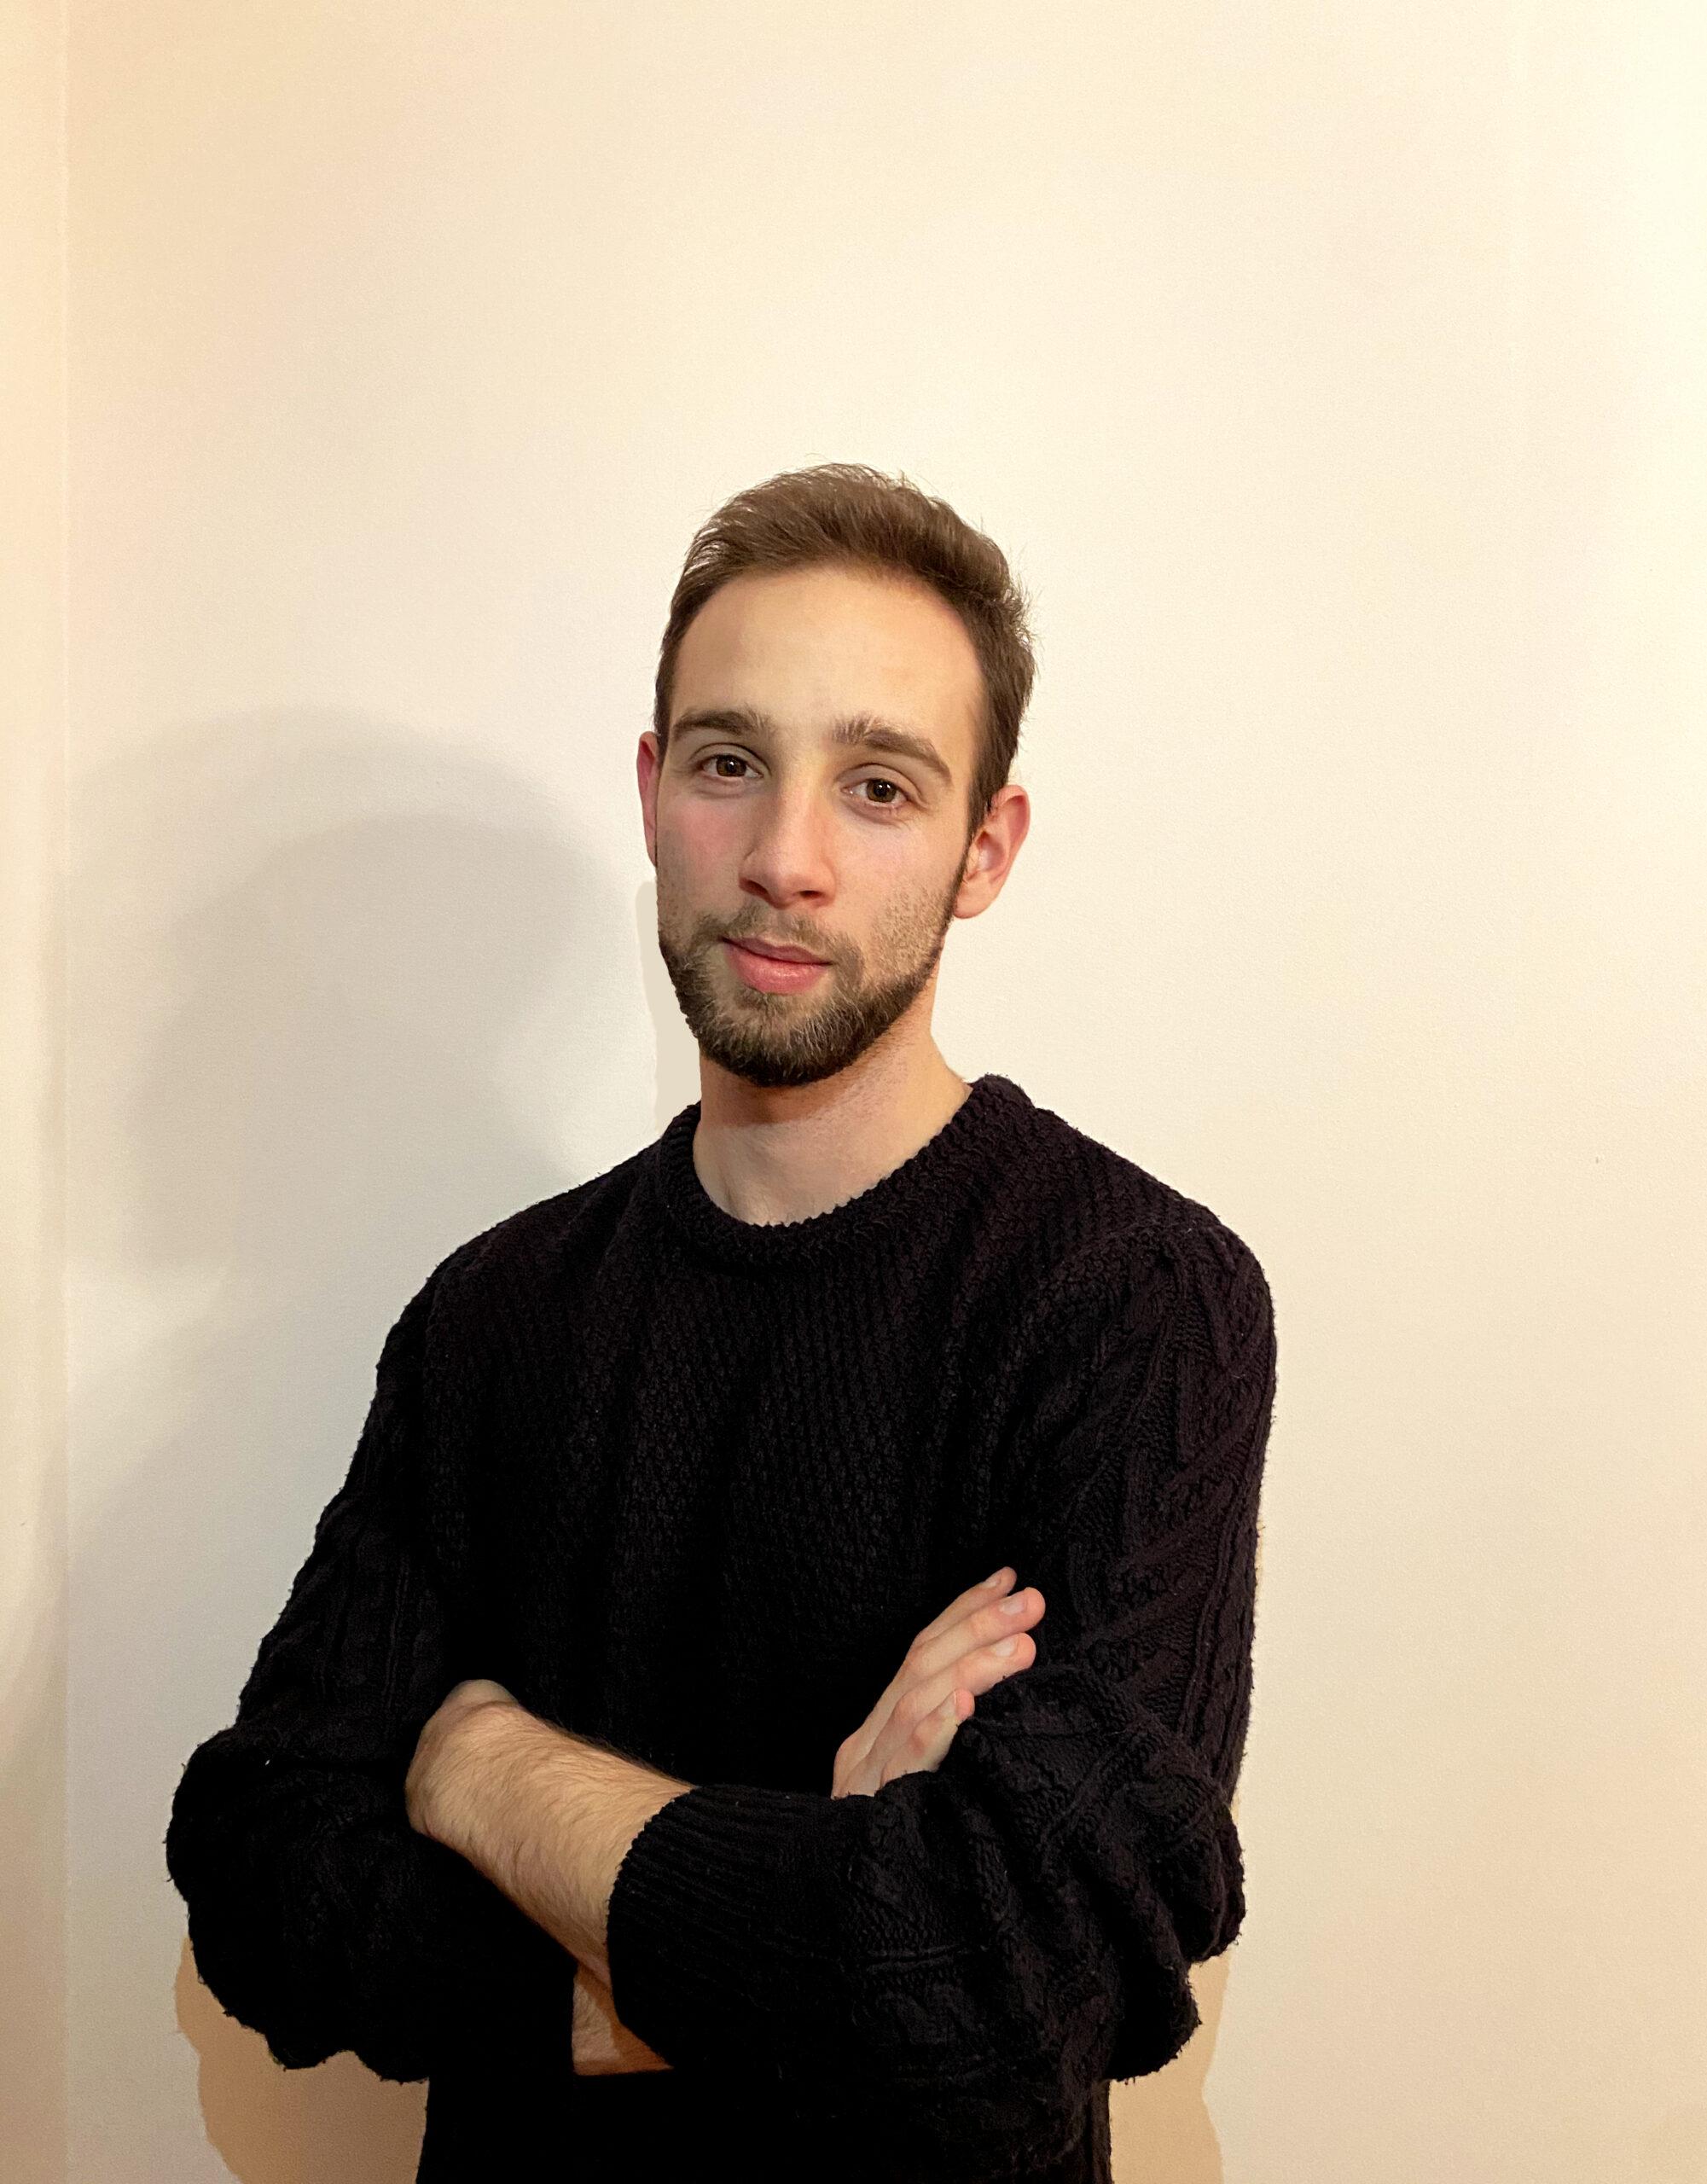 Roberto Robustelli